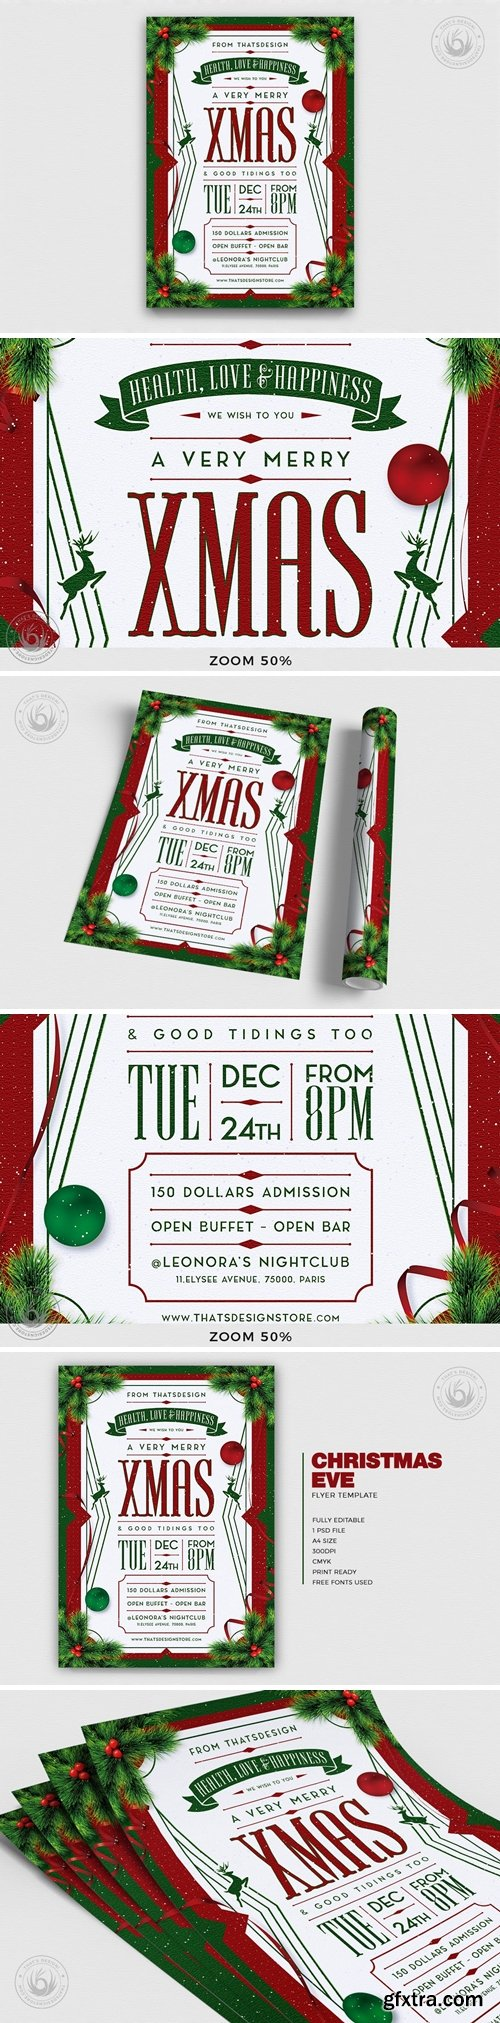 Christmas Eve Flyer Template V8